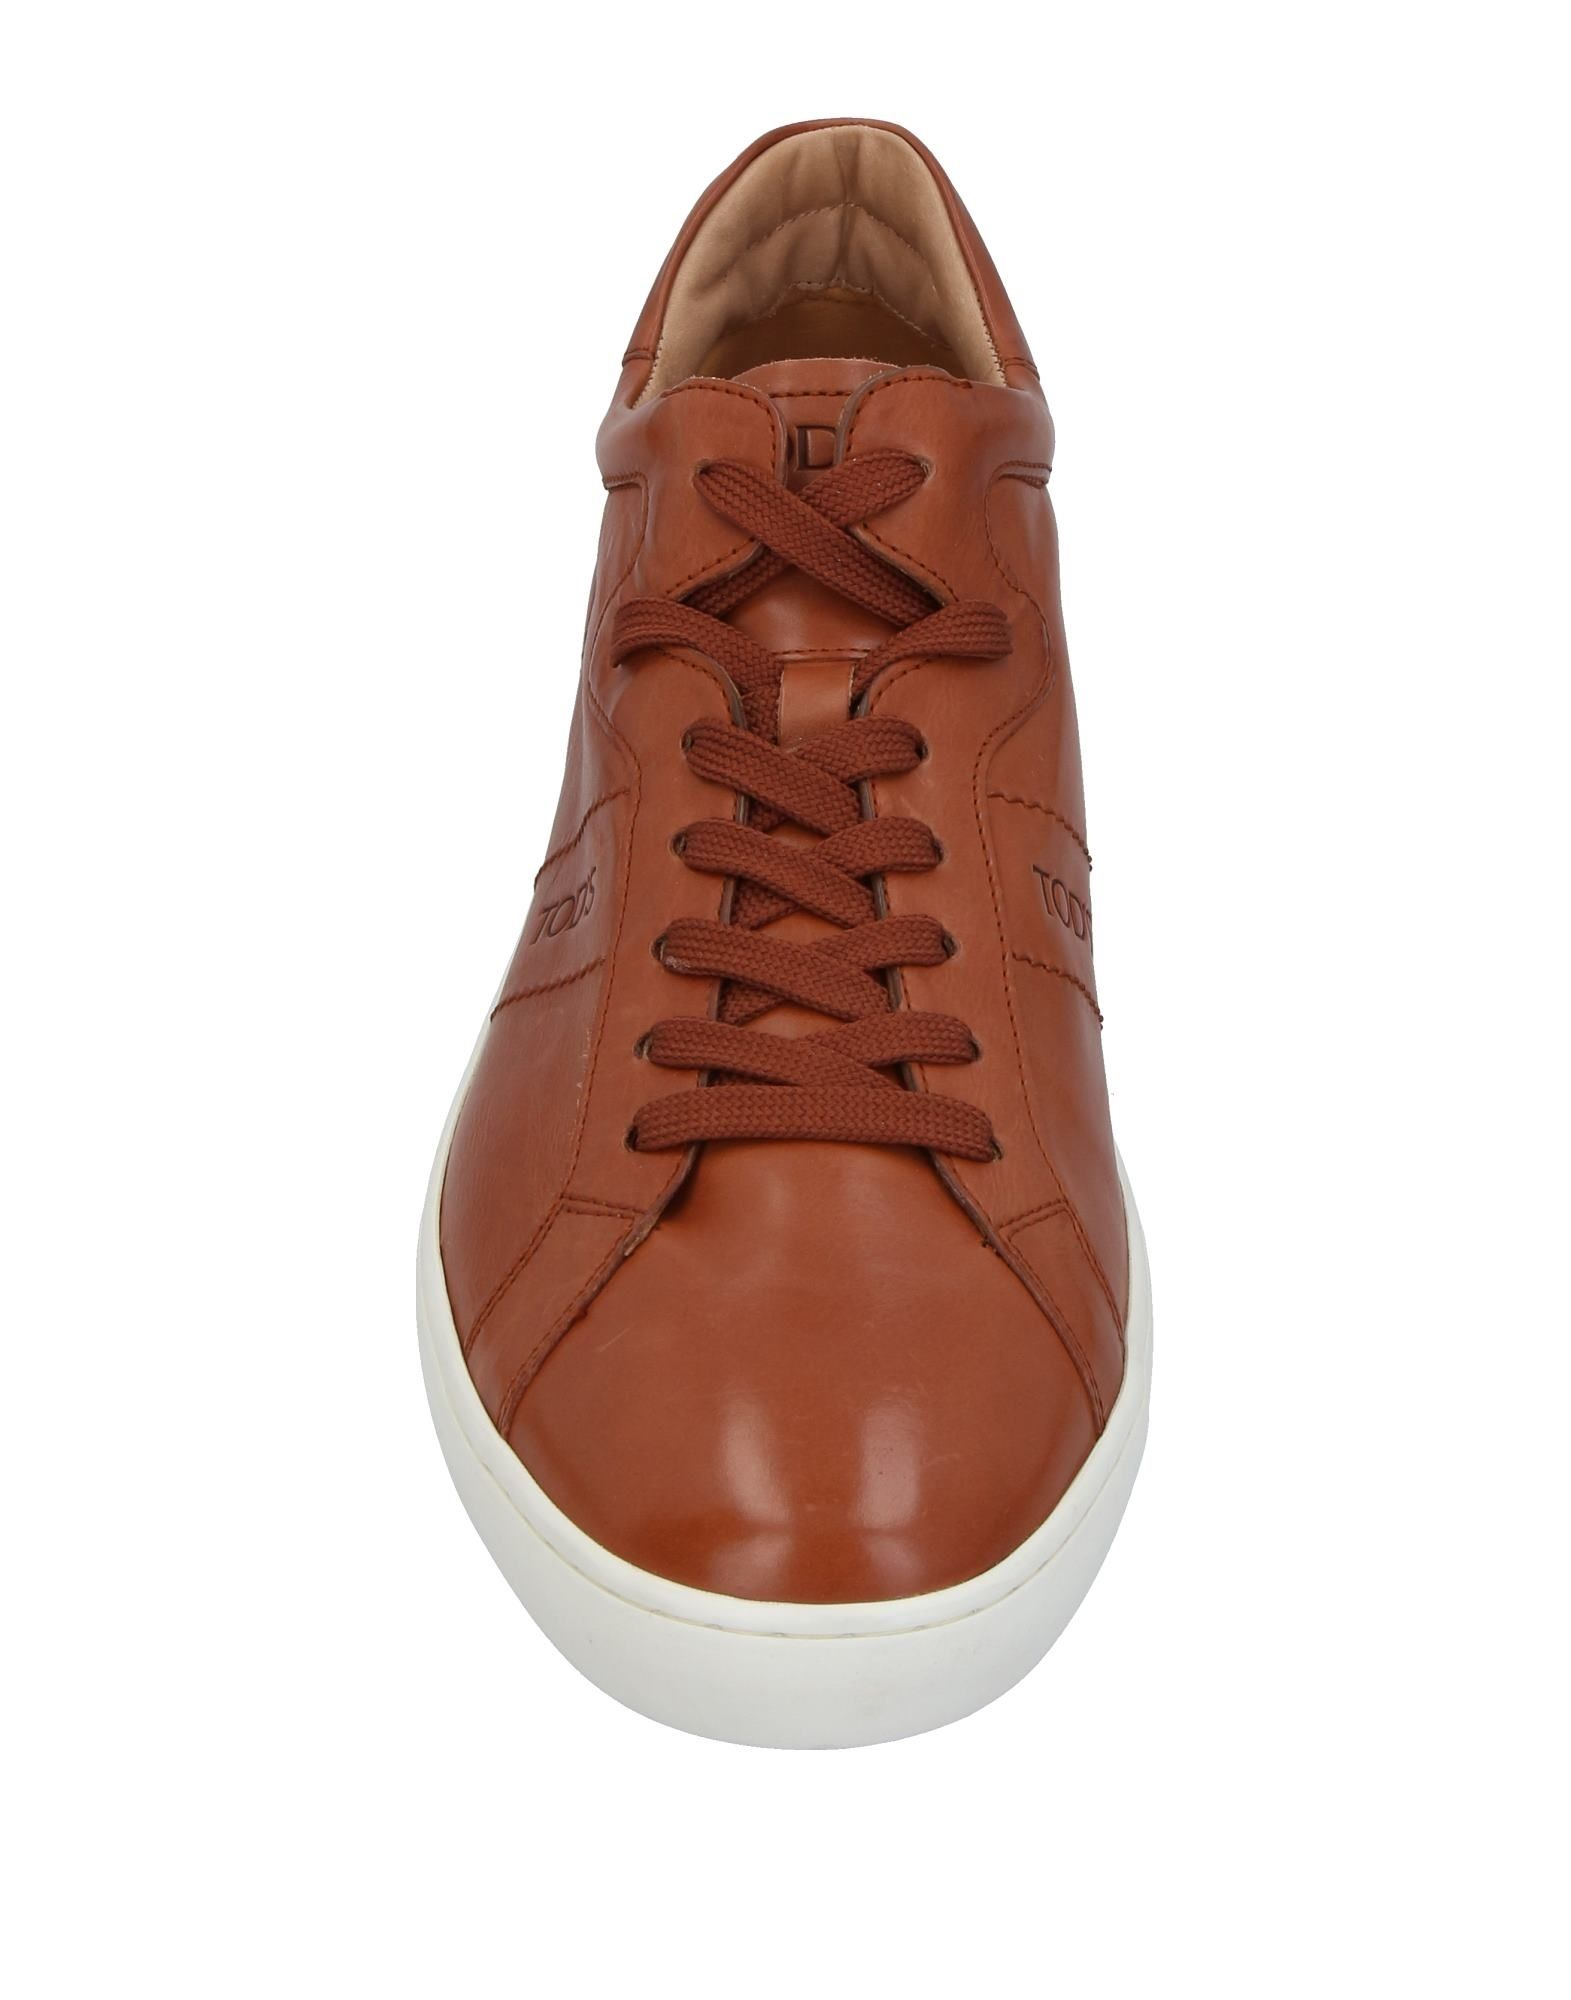 Tod's Gute Sneakers Herren  11396943SV Gute Tod's Qualität beliebte Schuhe 8bc2e6